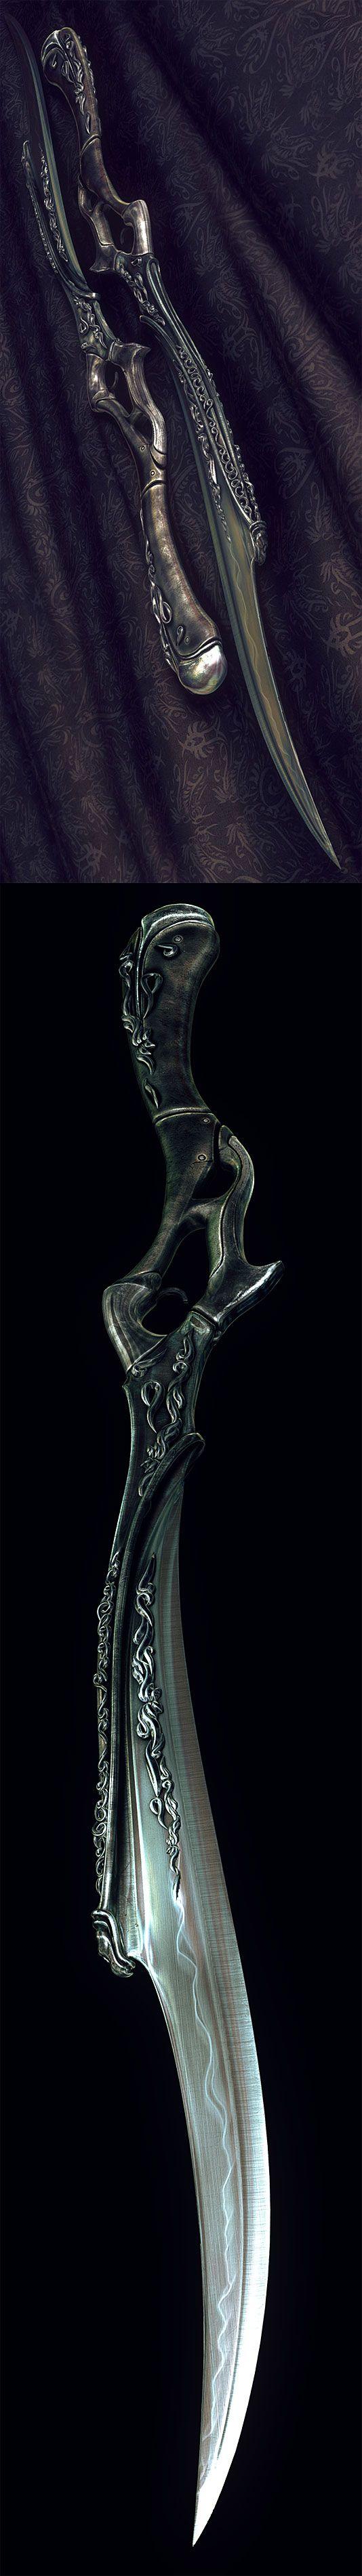 Darkness concept XVIII by Wen-JR.deviantart.com - that's a Josera weapon, all the way, wow